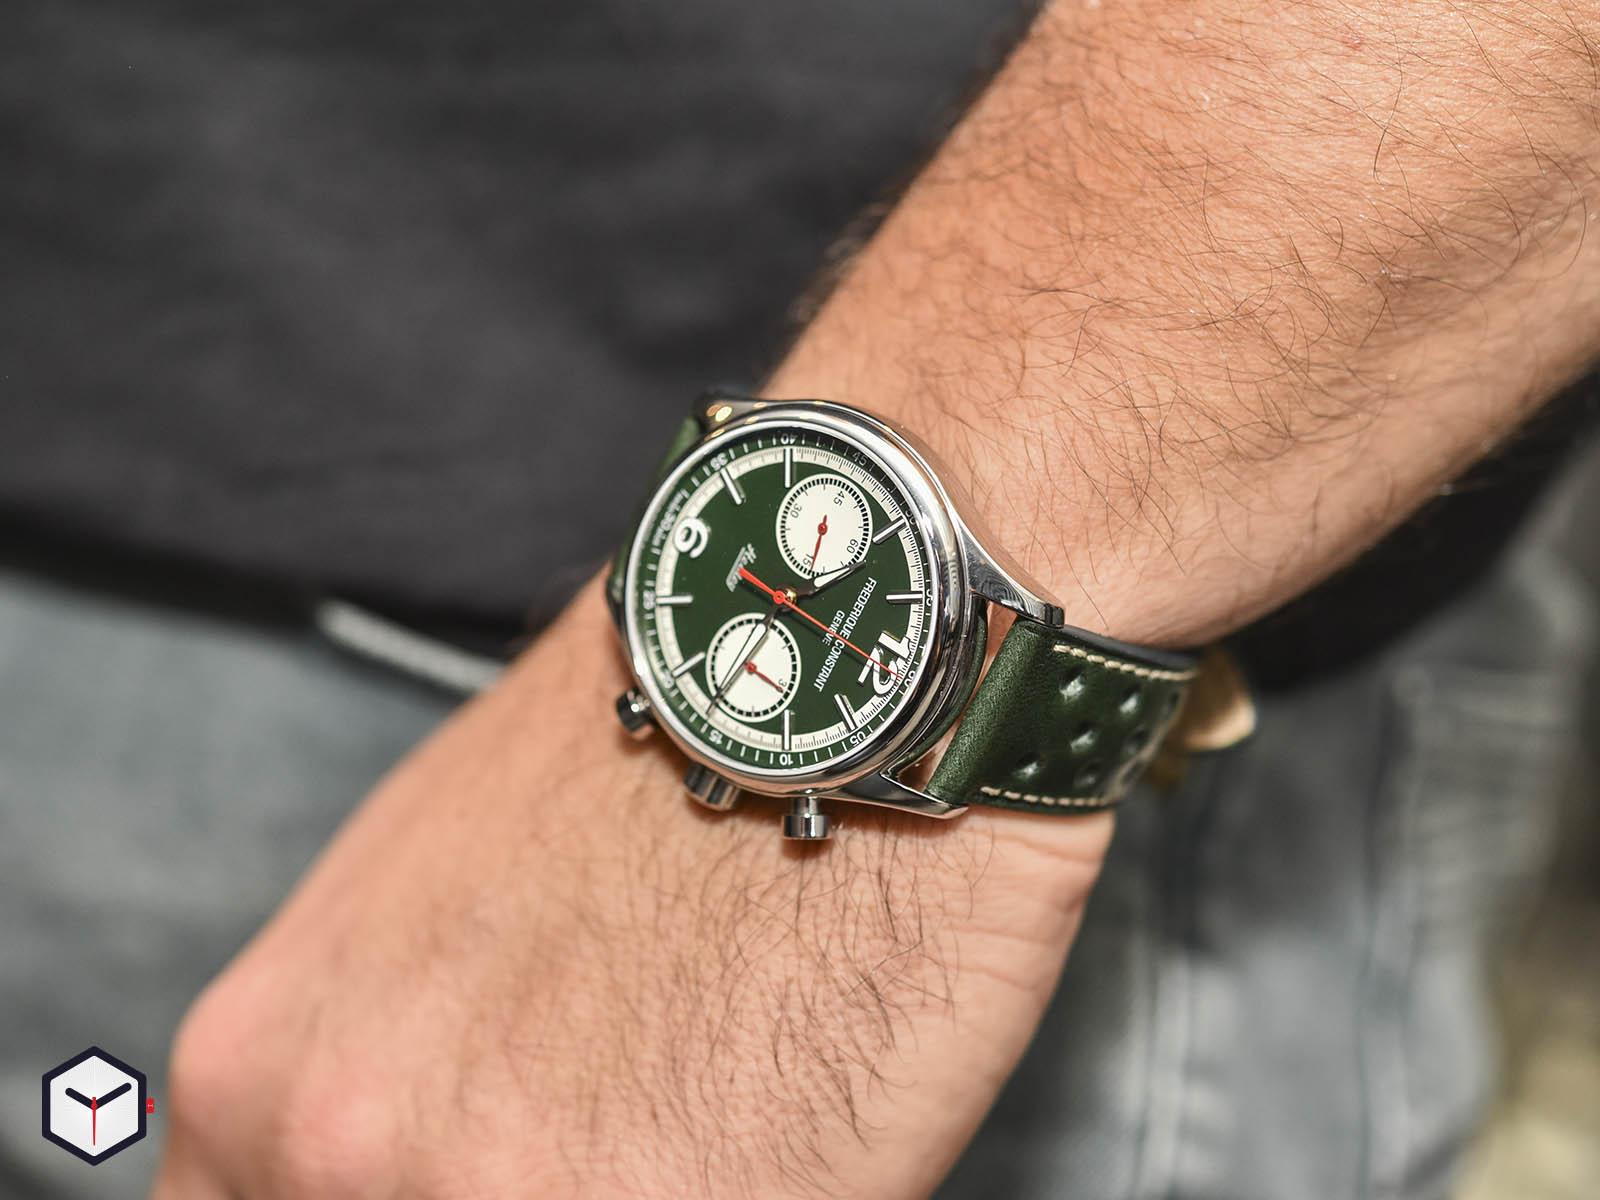 fc-397hgr5b6-frederique-constant-vintage-rally-healey-chronograph-7.jpg